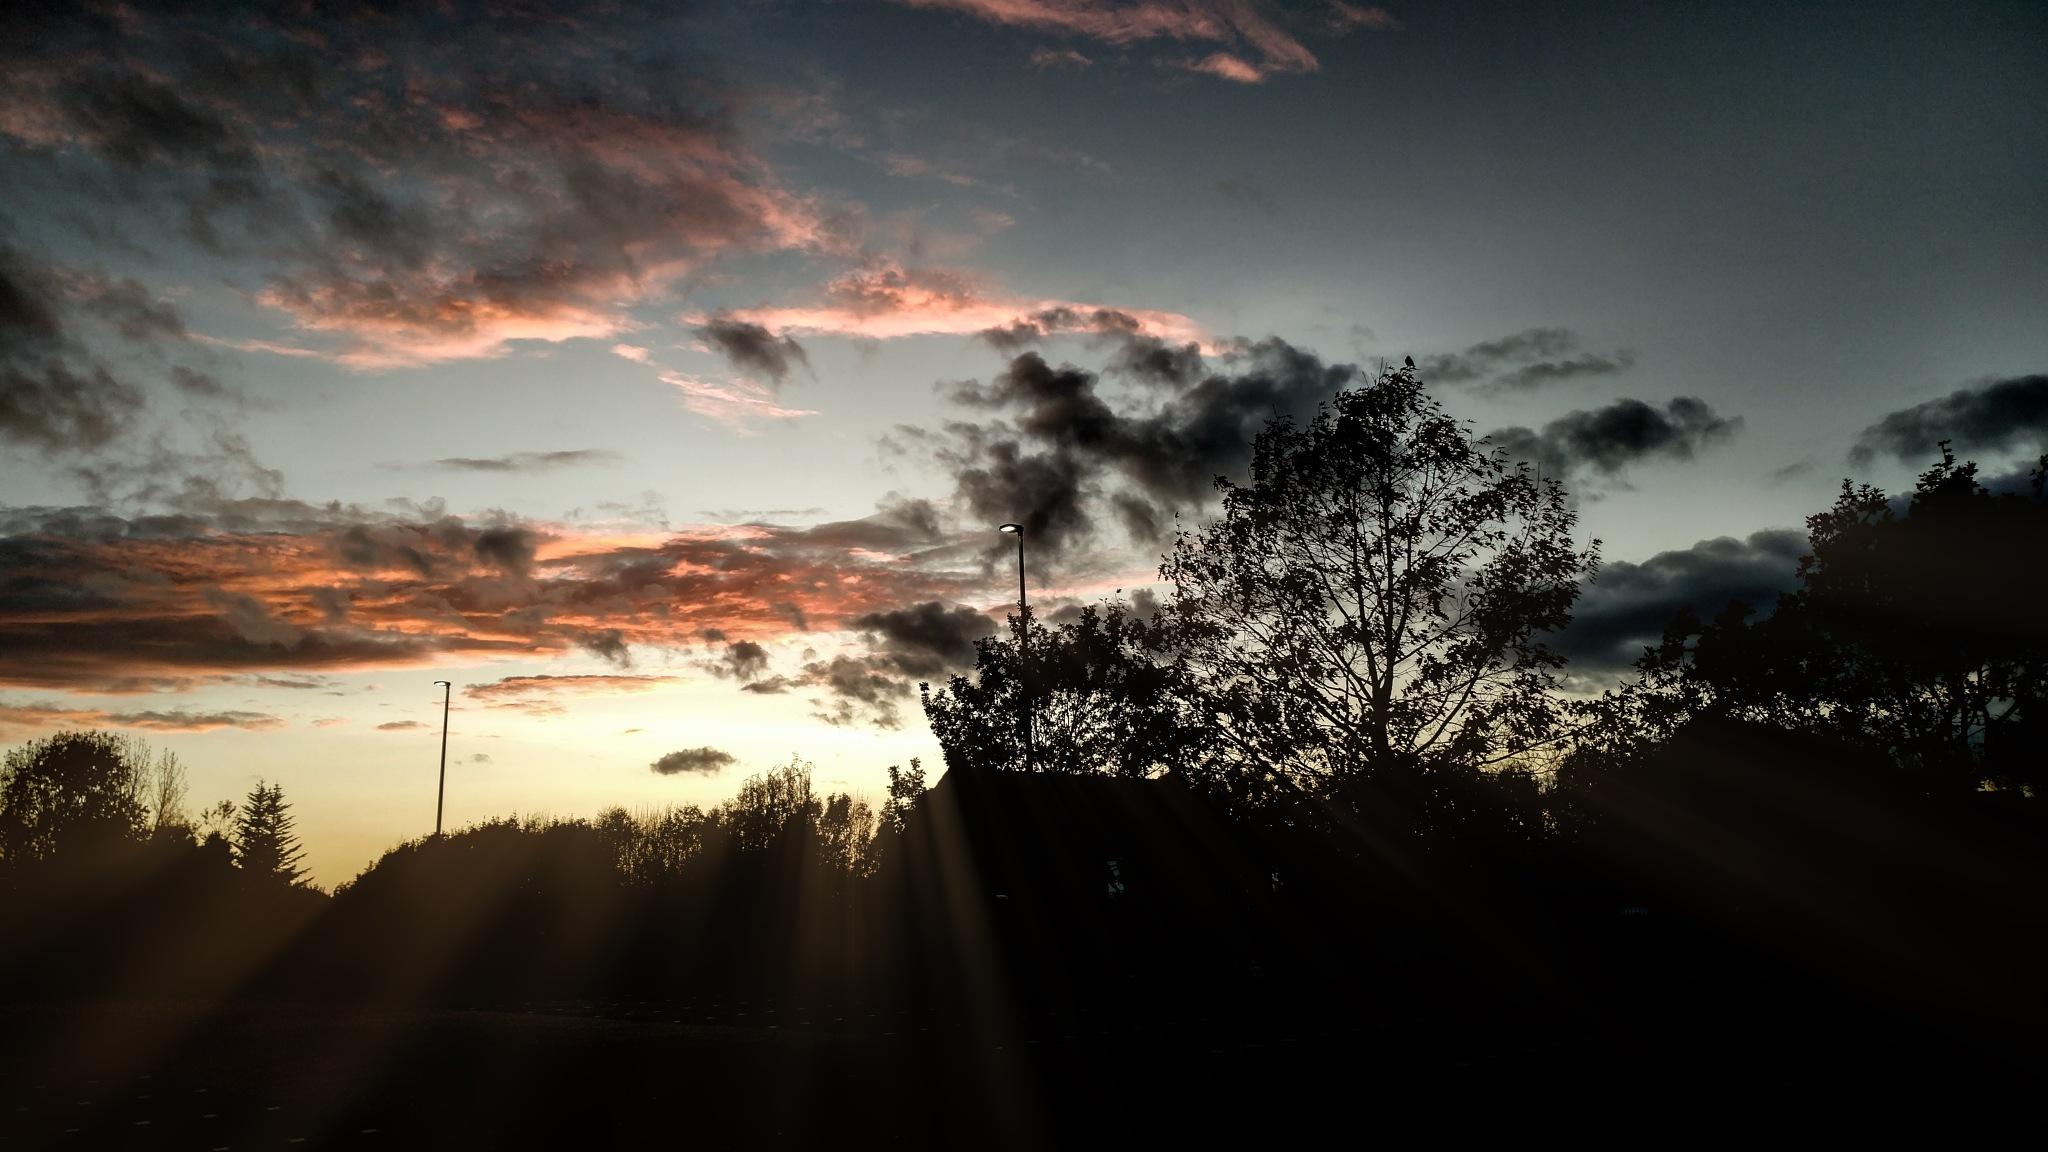 Sunset by FoTorsten